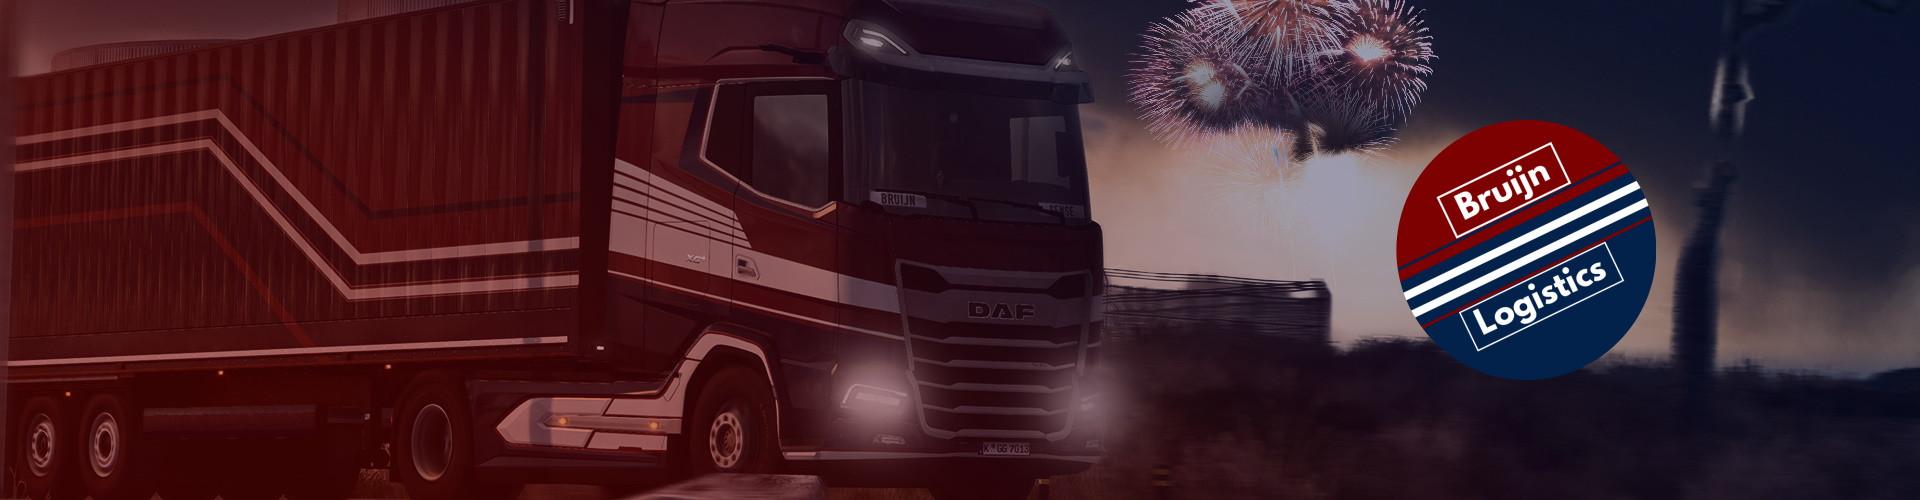 Bruijn Logistics 1 Year Anniversary